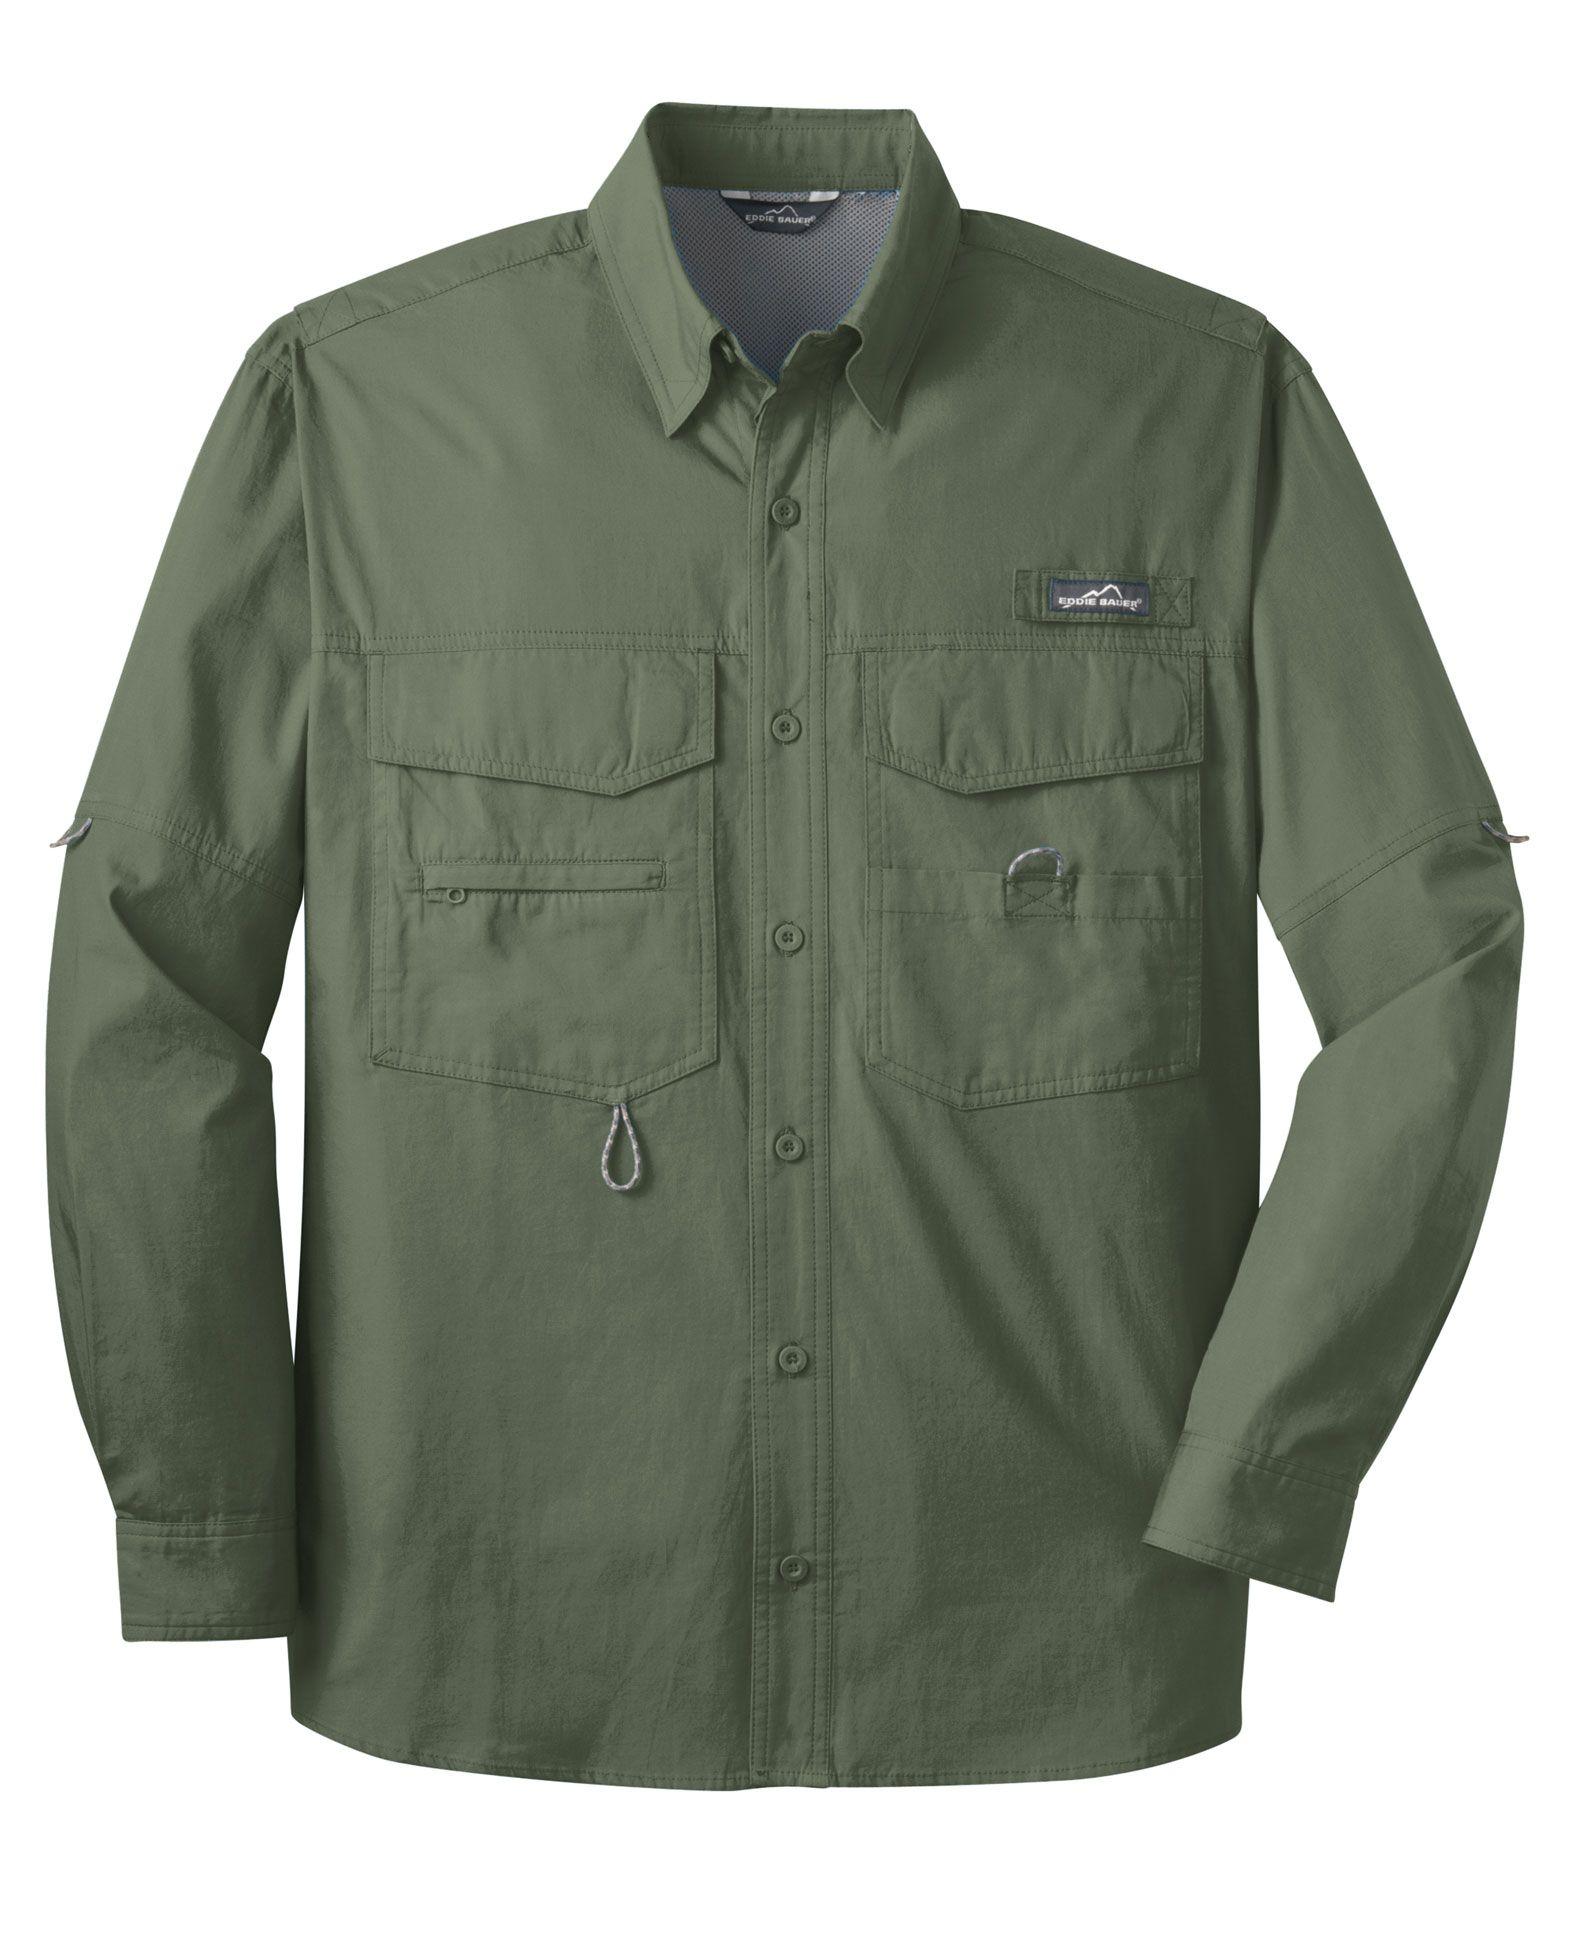 Eddie Bauer Long Sleeve Fishing Shirt Customize As Low As 4999